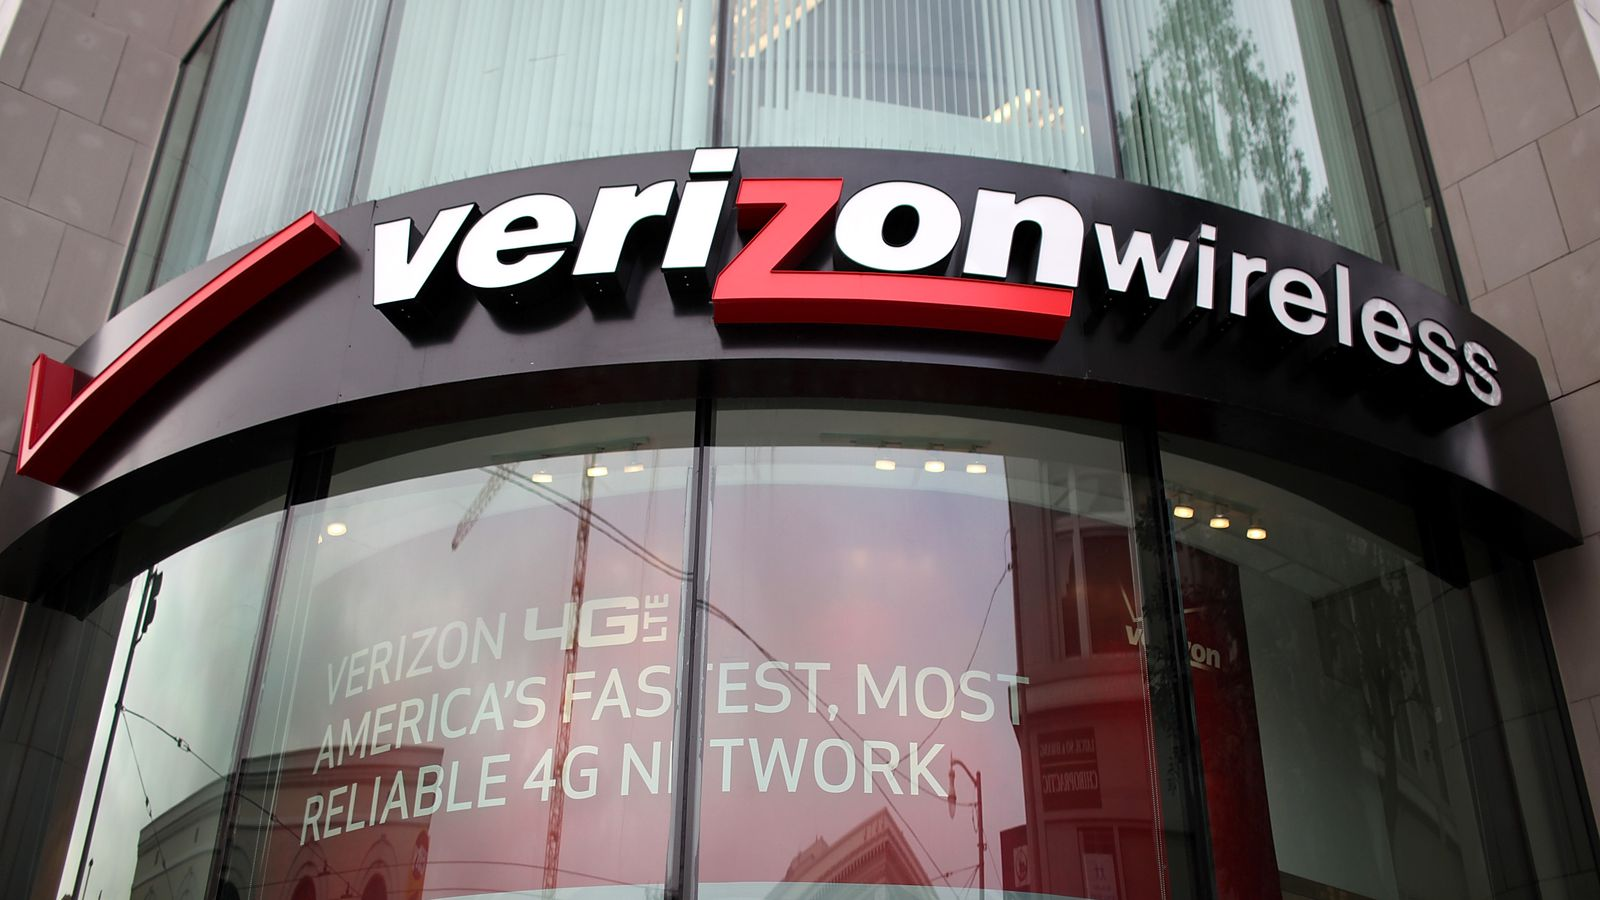 Verizon partner data breach exposes millions of customer records – The Verge